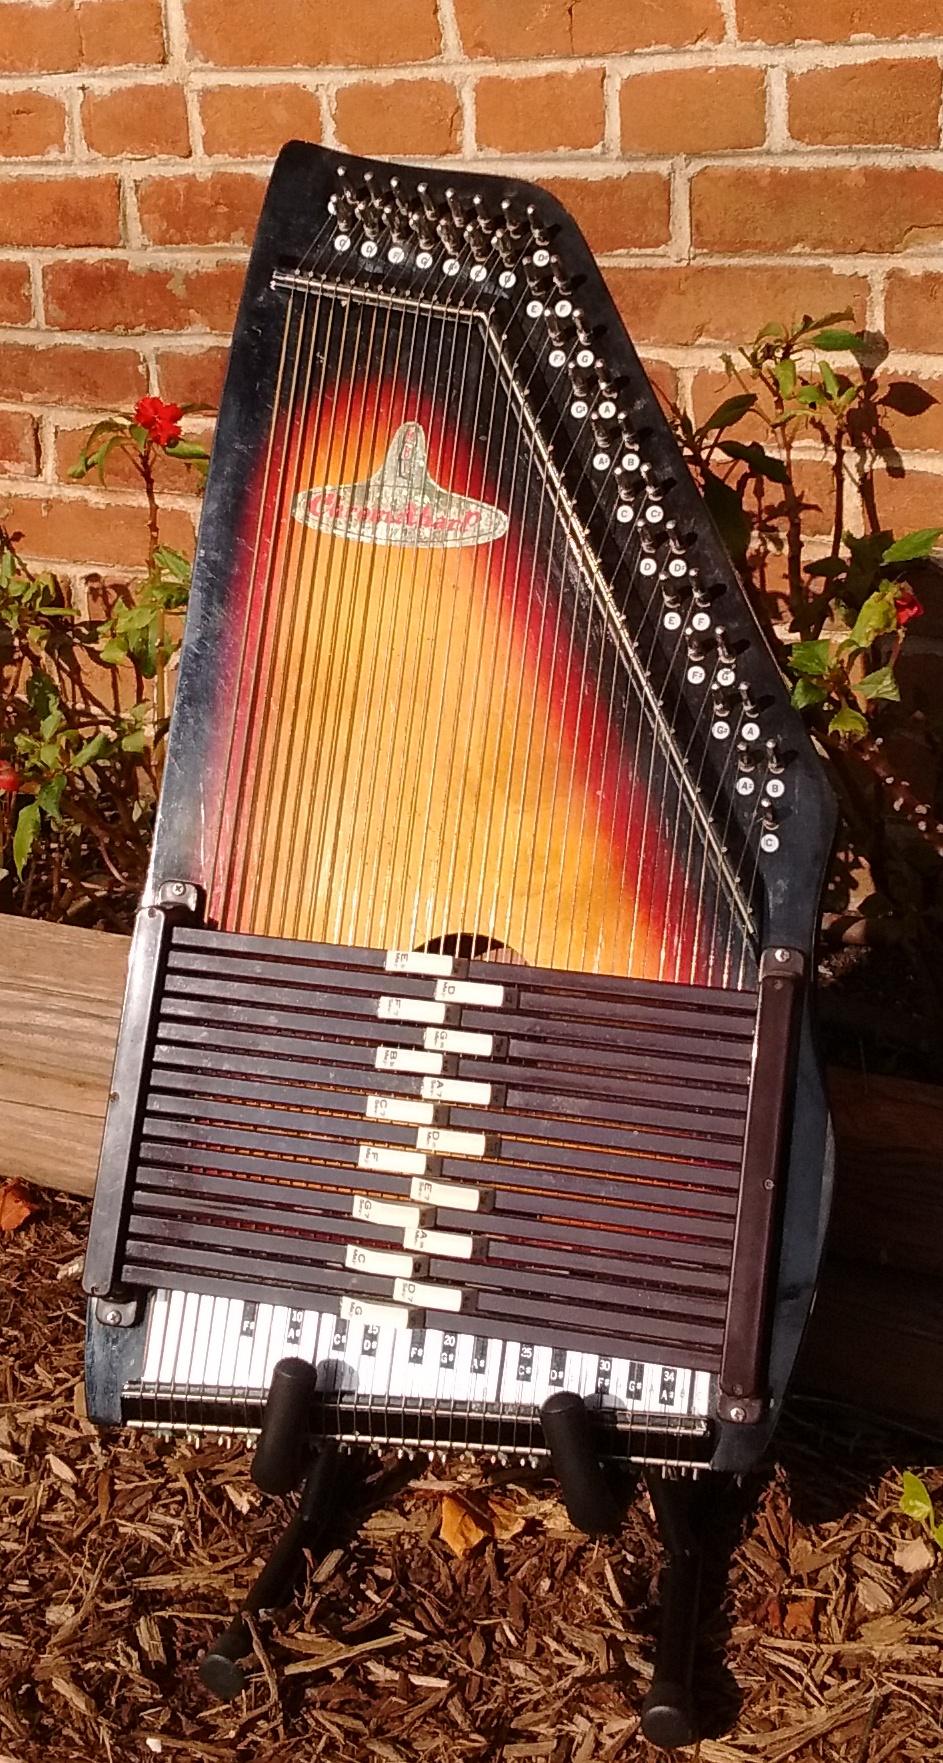 15-Chord ChromaHarp Autoharp by Rhythm Band, Inc.